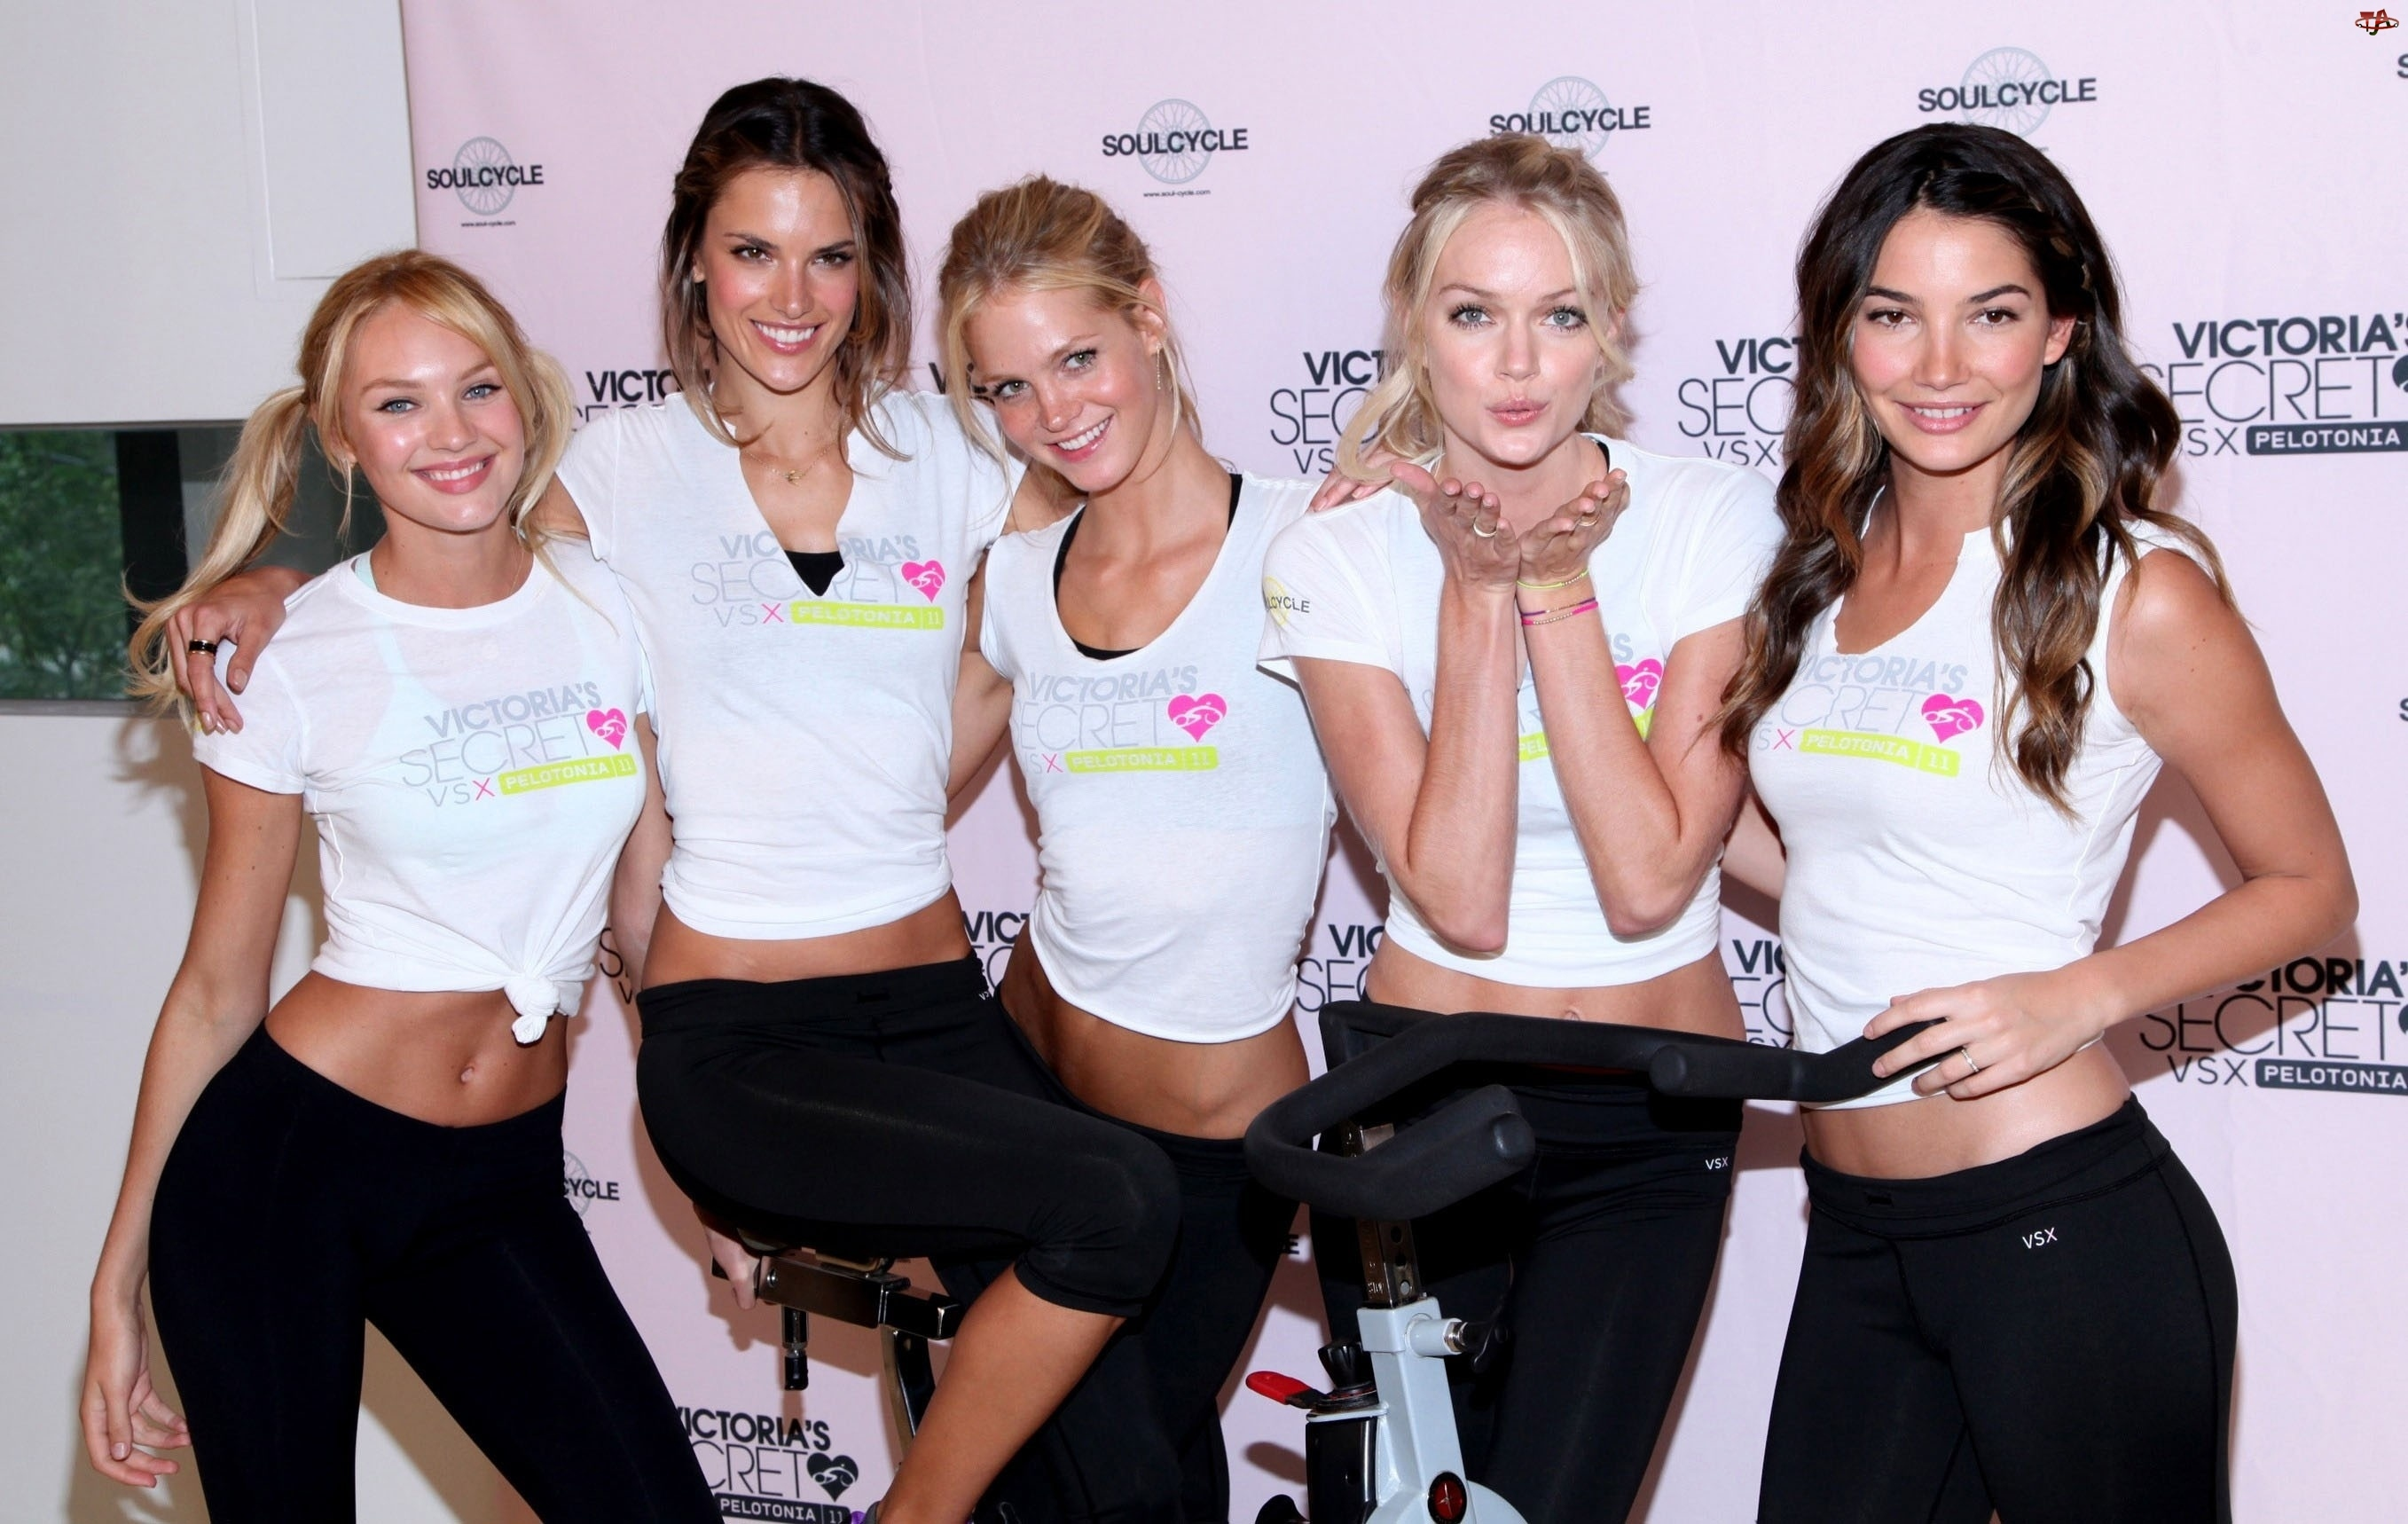 Lily Aldridge, Modelki, Erin Heatherton, Lindsay Ellingson, Candice Swanepoel, Alessandra Ambrosio